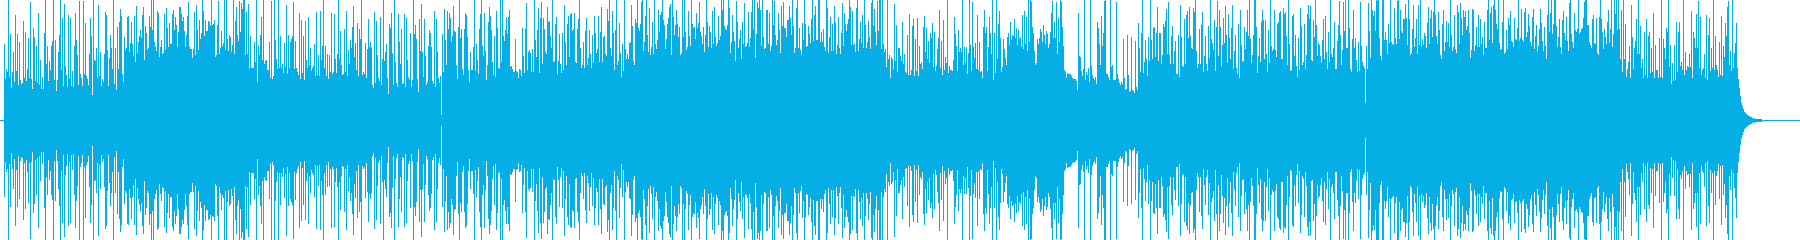 「POWER/ROCK」BGM331の再生済みの波形